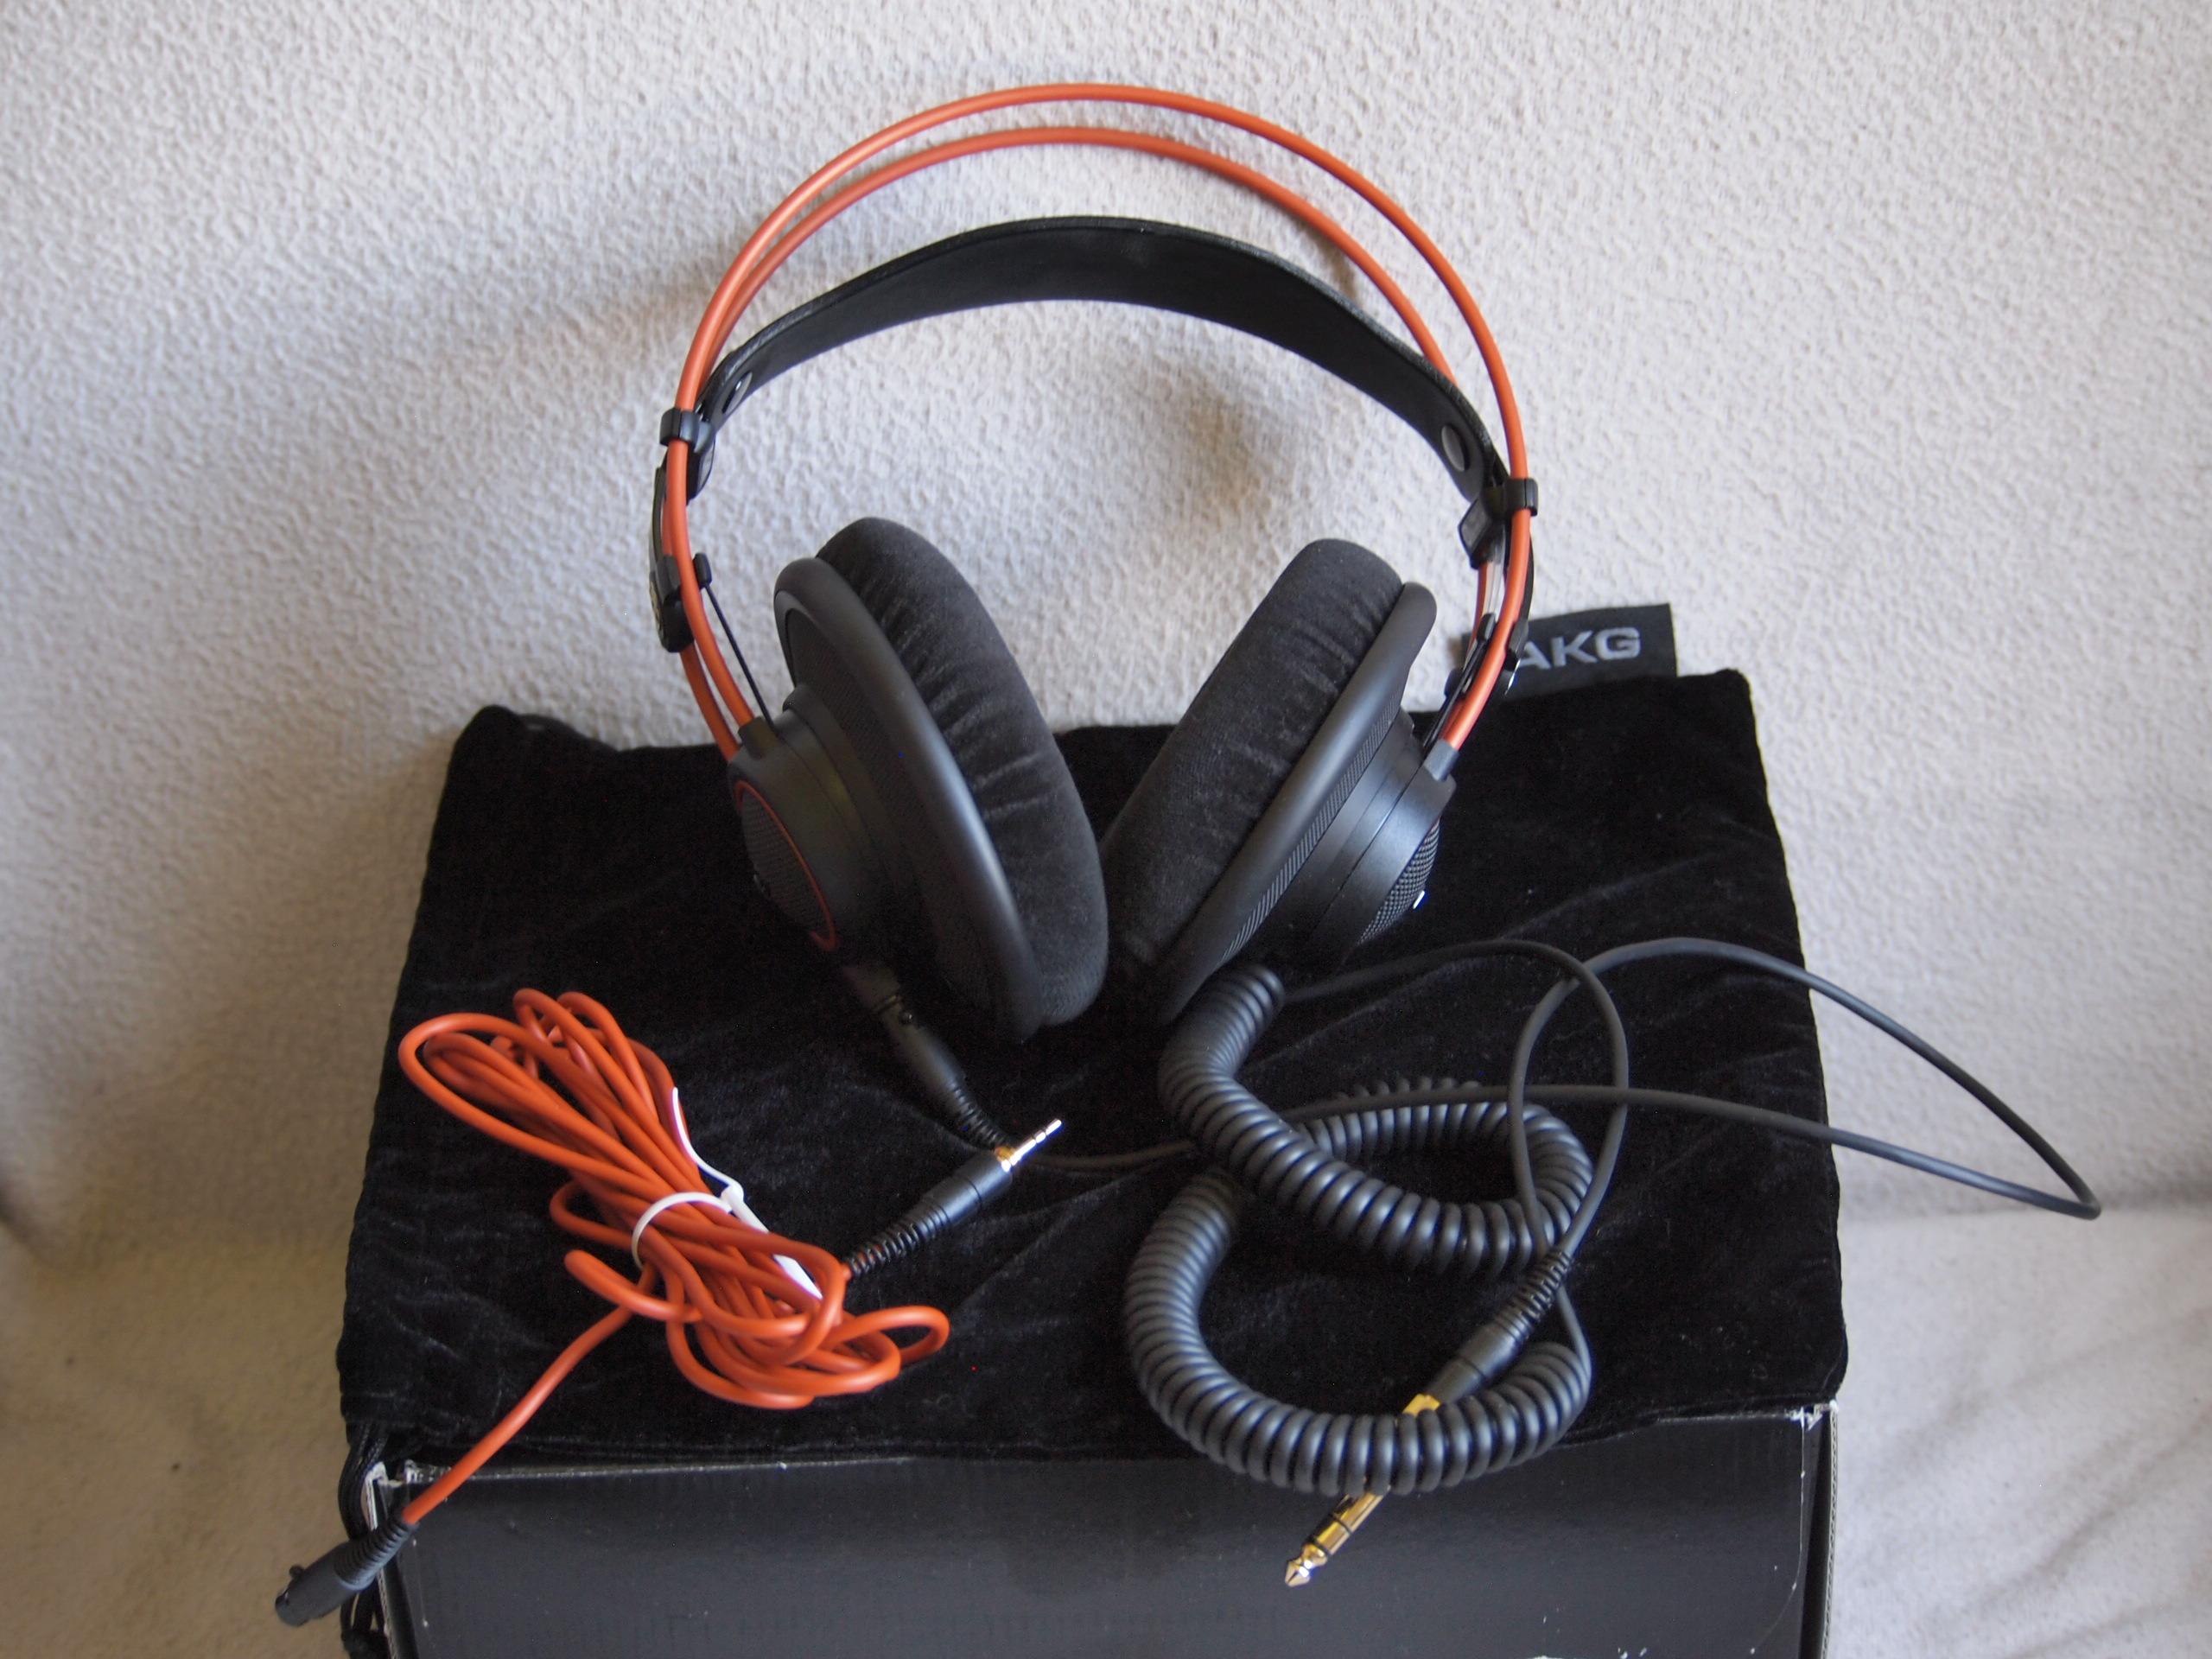 K712 Pro Akg K712 Pro Audiofanzine